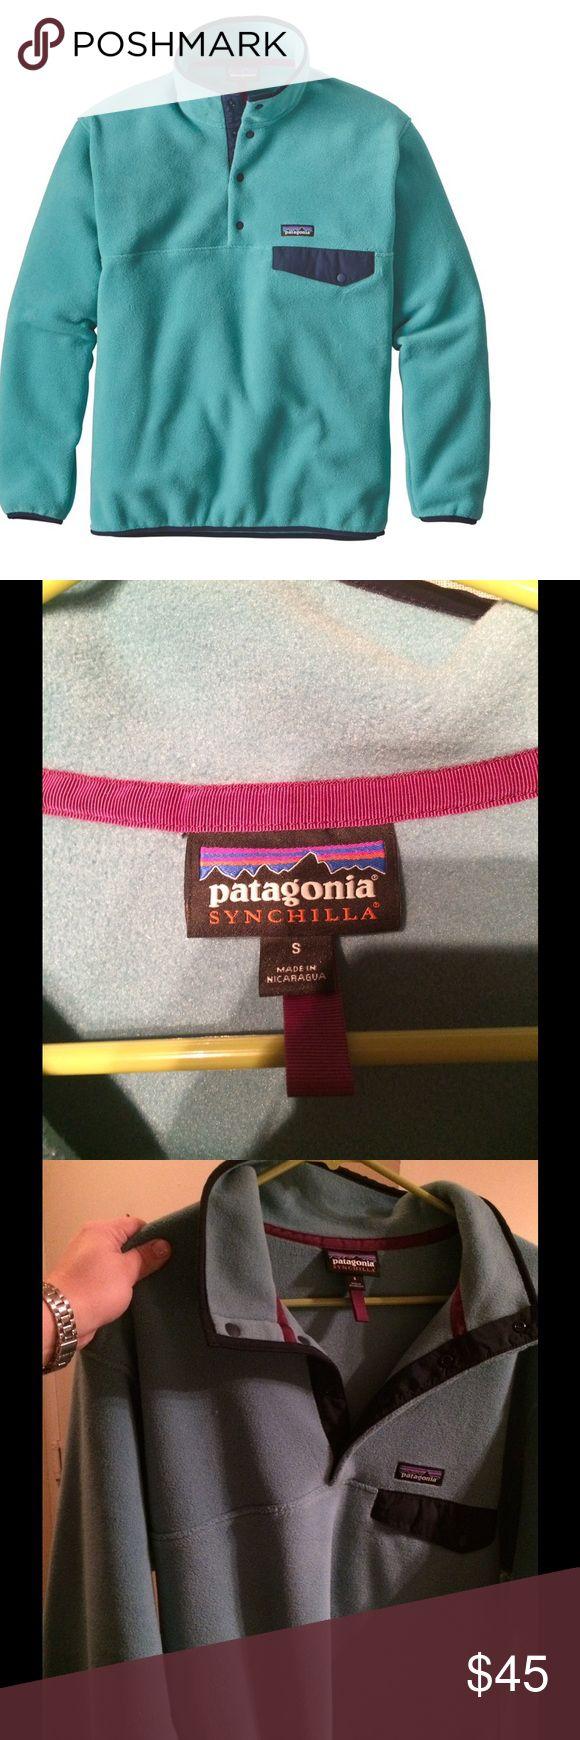 Patagonia Fleece - medium Medium Men's Patagonia fleece. Has been worn 2 times Patagonia Jackets & Coats Performance Jackets